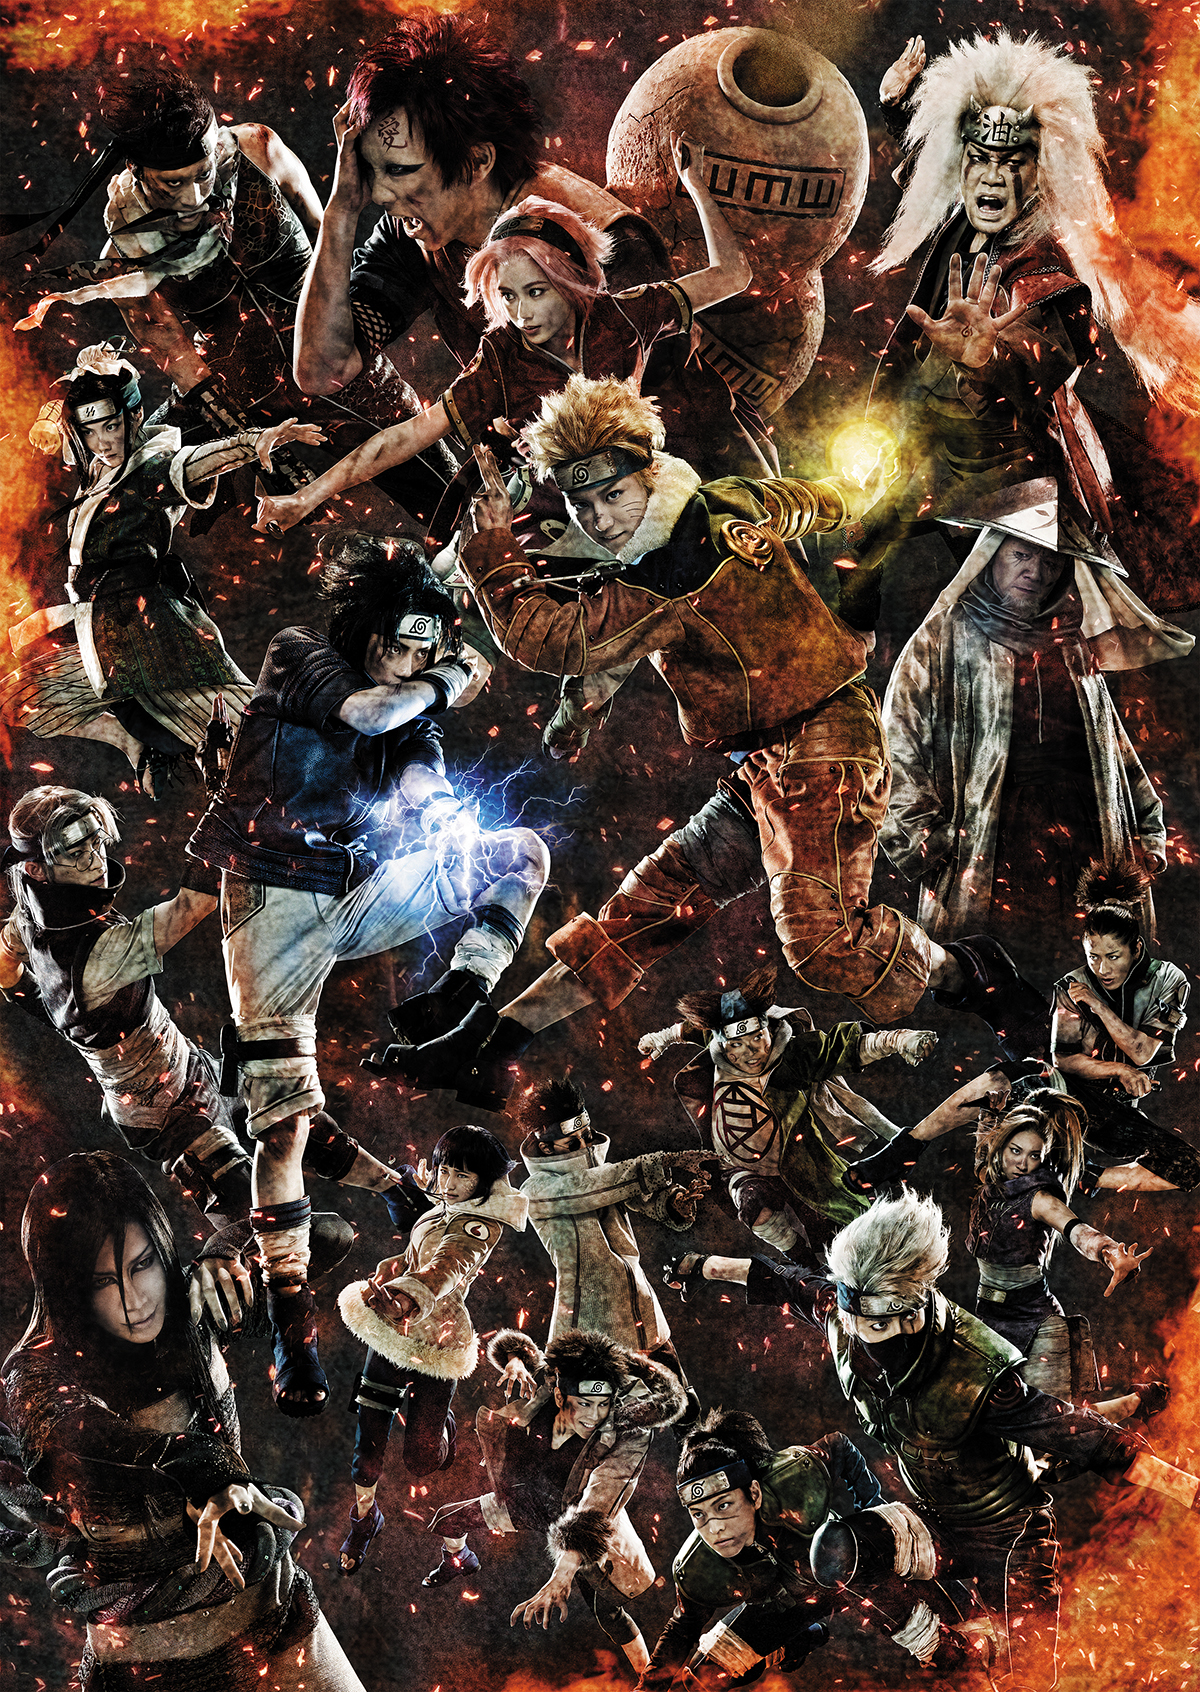 Naruto Stage Musical Visual Includes All 18 Characters haruhichan.com naruto musical visual